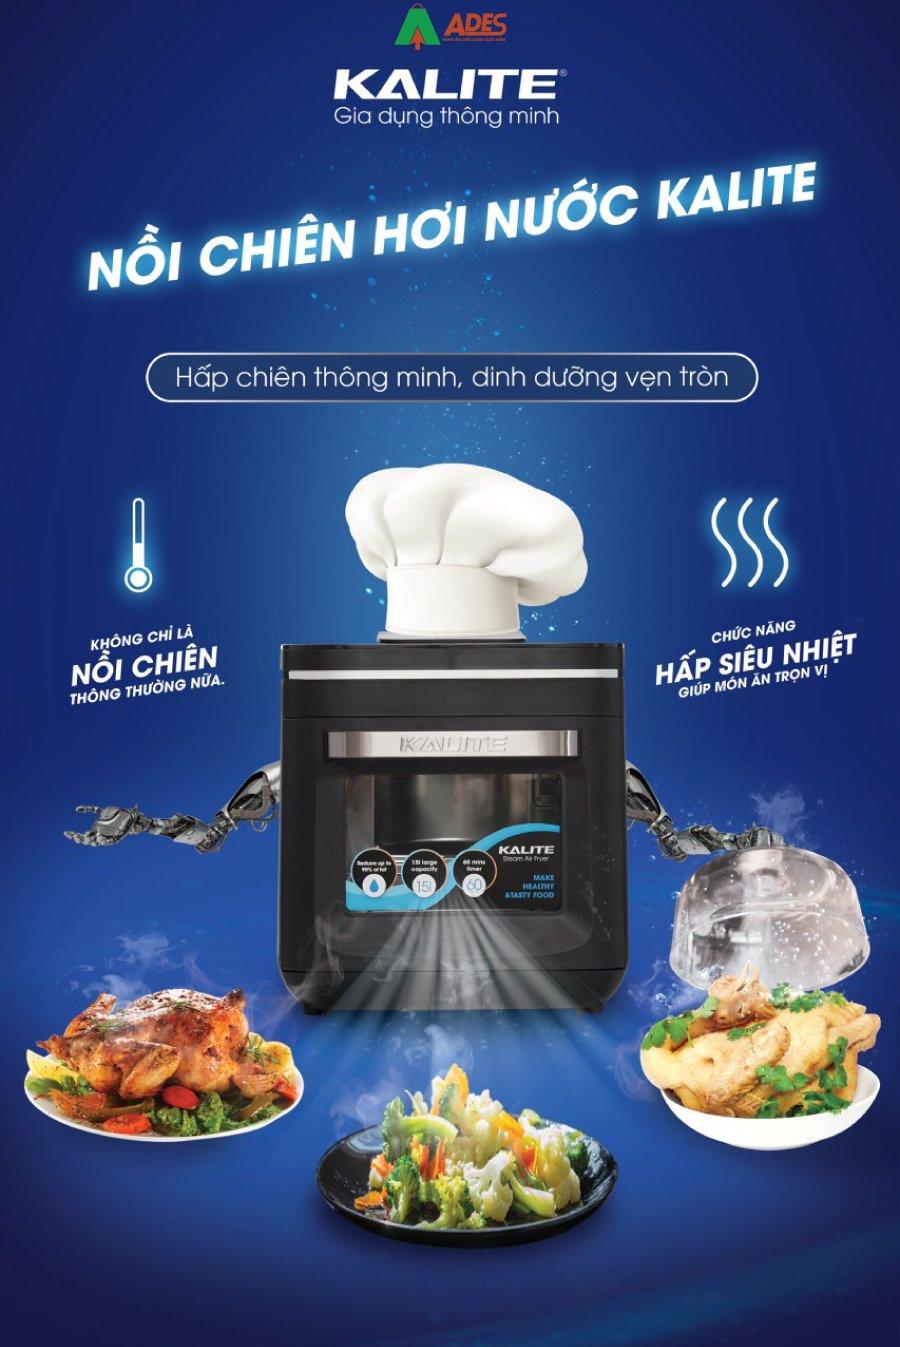 Noi Chien Khong Dau Kalite Steam X ti te trong tung chi tiet nho